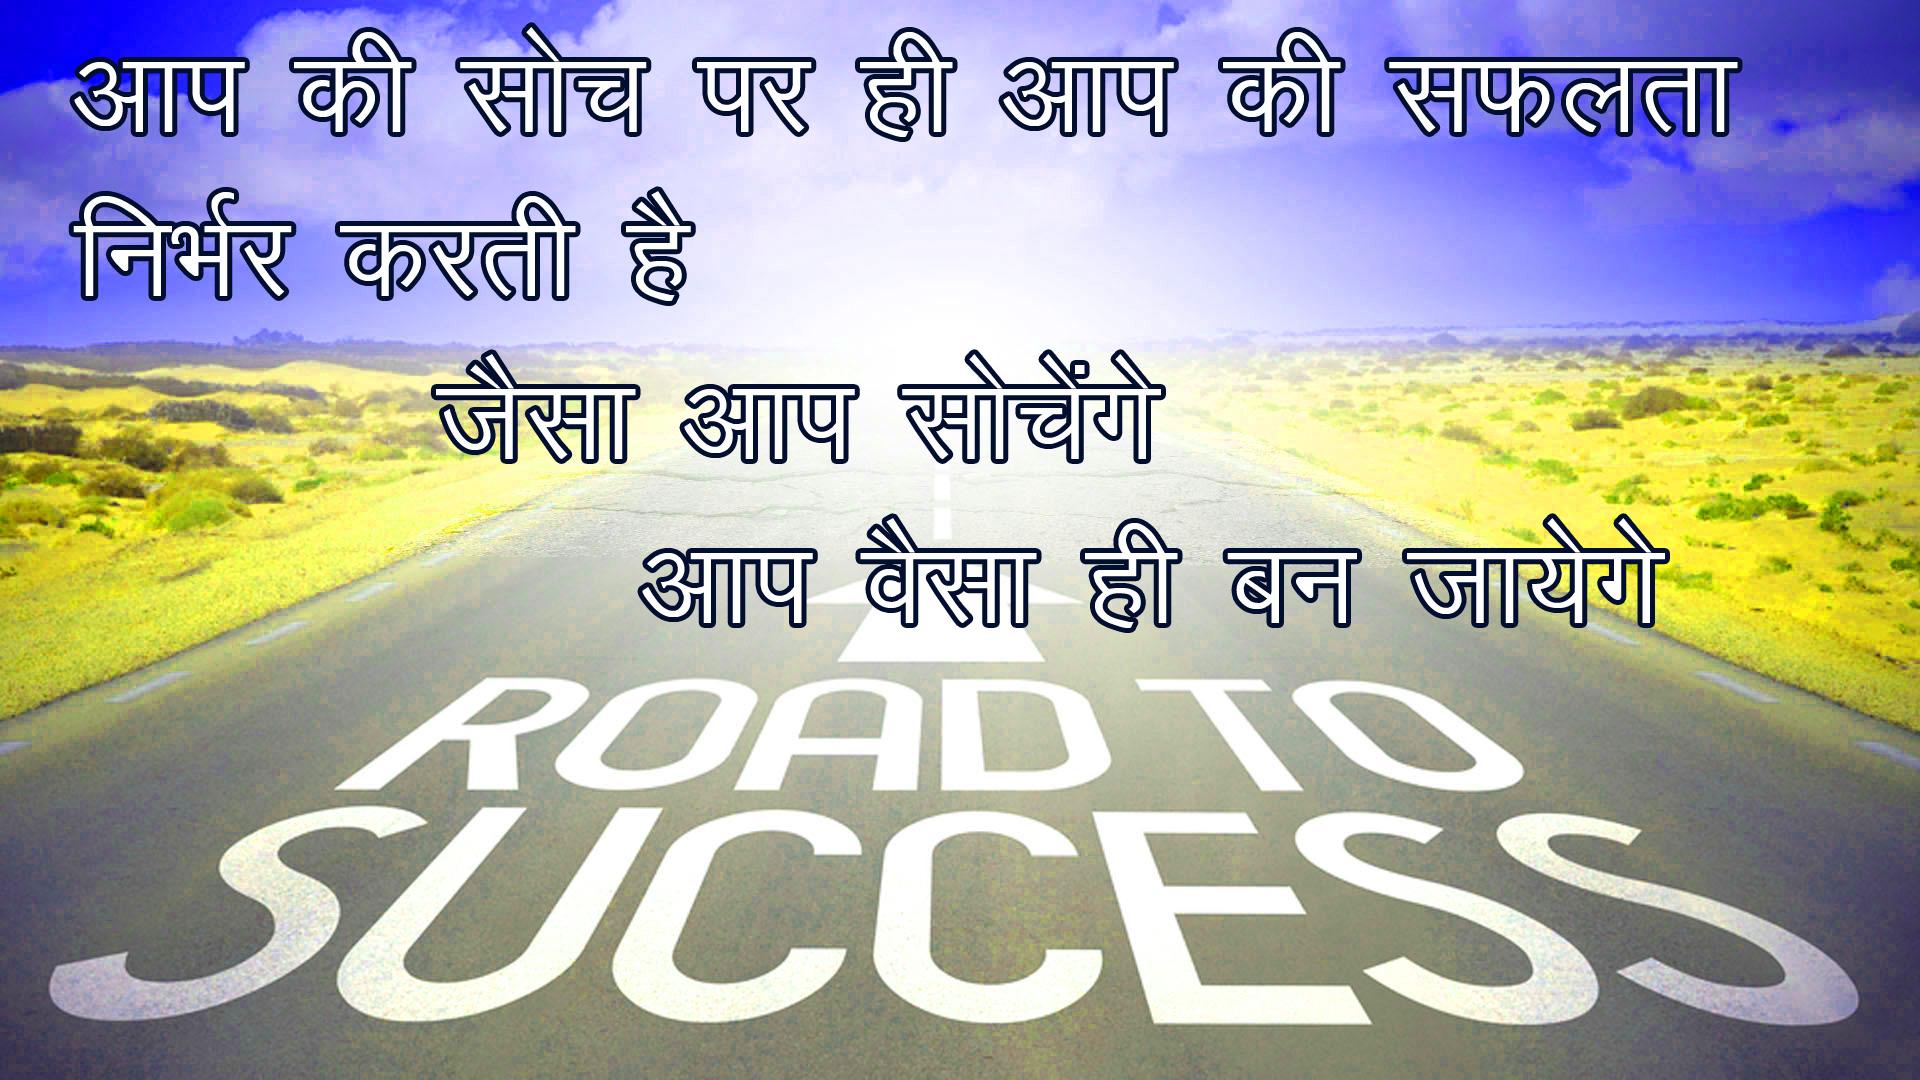 Hindi Status Images Pics Free For Whatsapp / Facebook